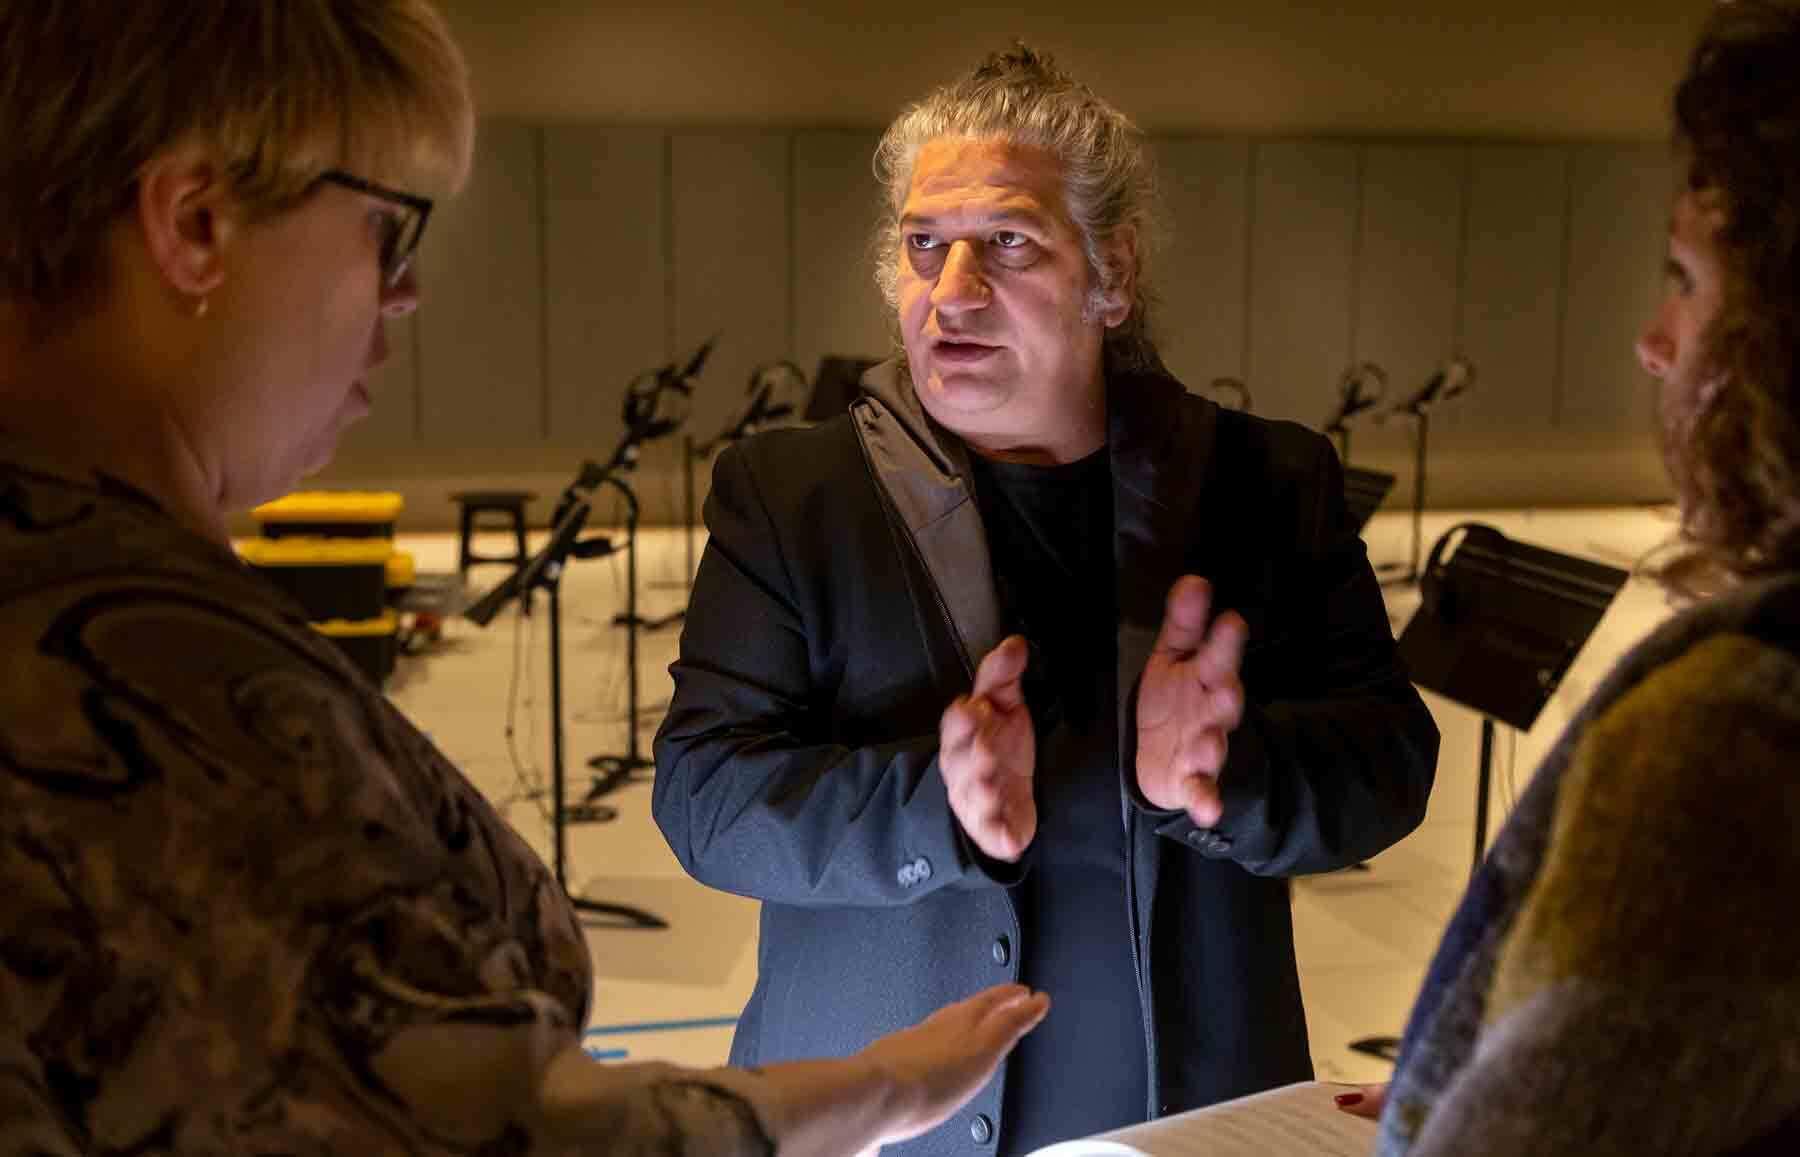 Carlos Garaicoa preparing his exhibition with PEM staff. Photo by Kathy Tarantola/PEM.